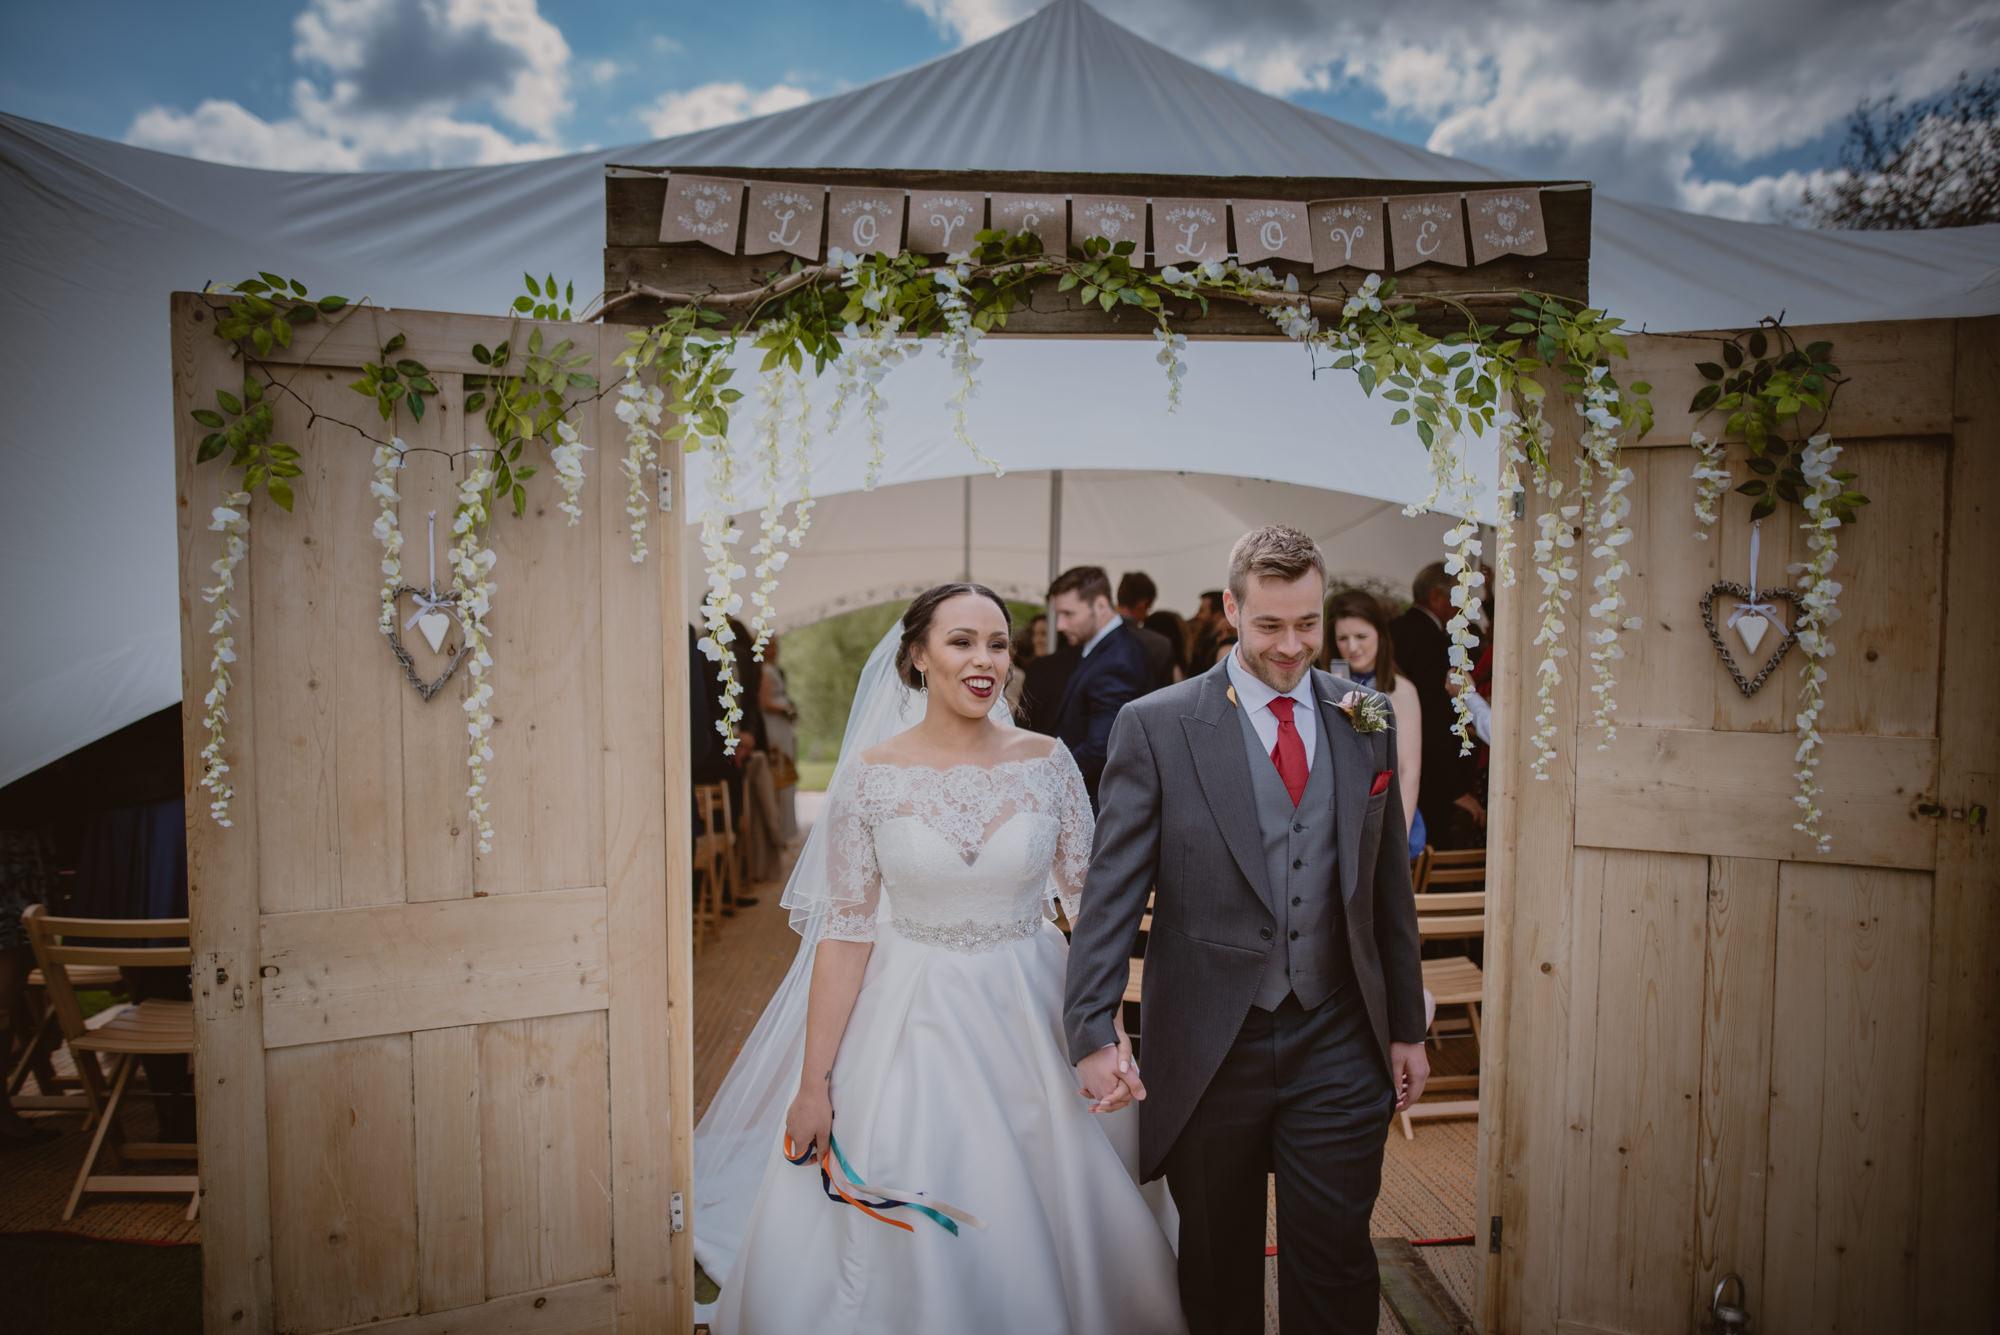 Jacqueline-Gareth-Wedding-Westmead-Events-Surrey-Manu-Mendoza-Wedding-Photography-280.jpg